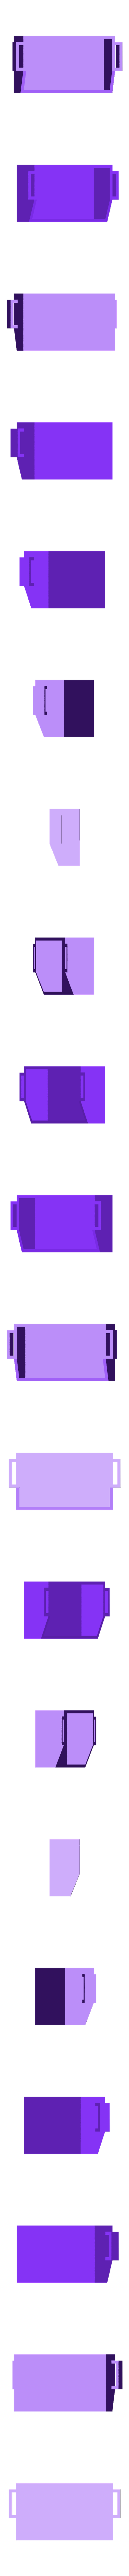 playmobil_toolbox_body.stl Download free STL file Playmobil toolbox with tools • 3D printable template, sokinkeso